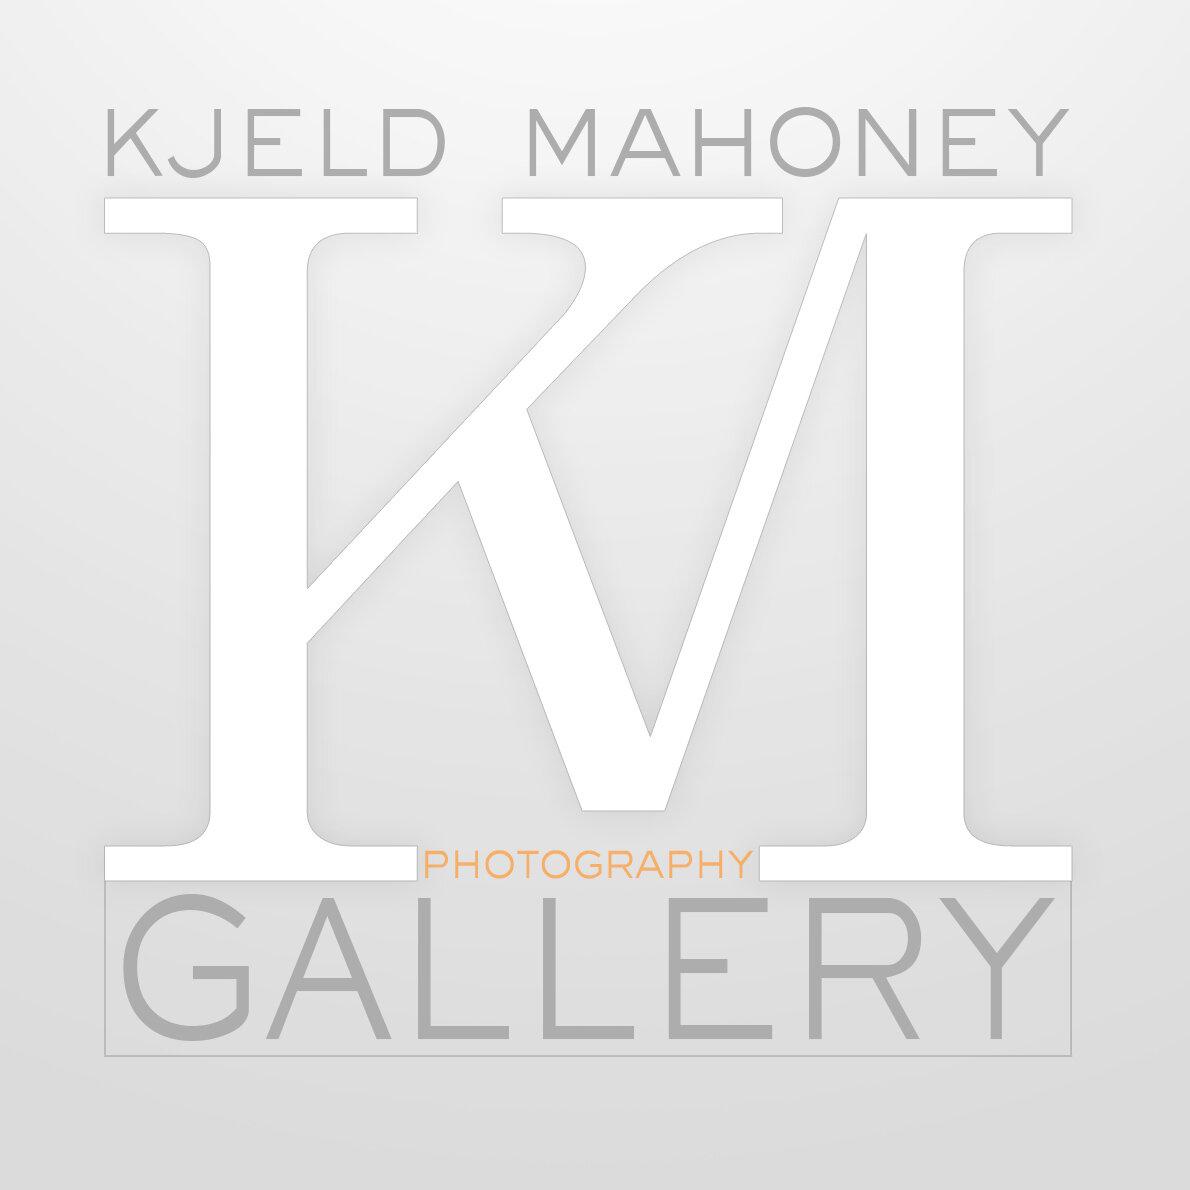 kjeld_mahoney_photography_final.jpg